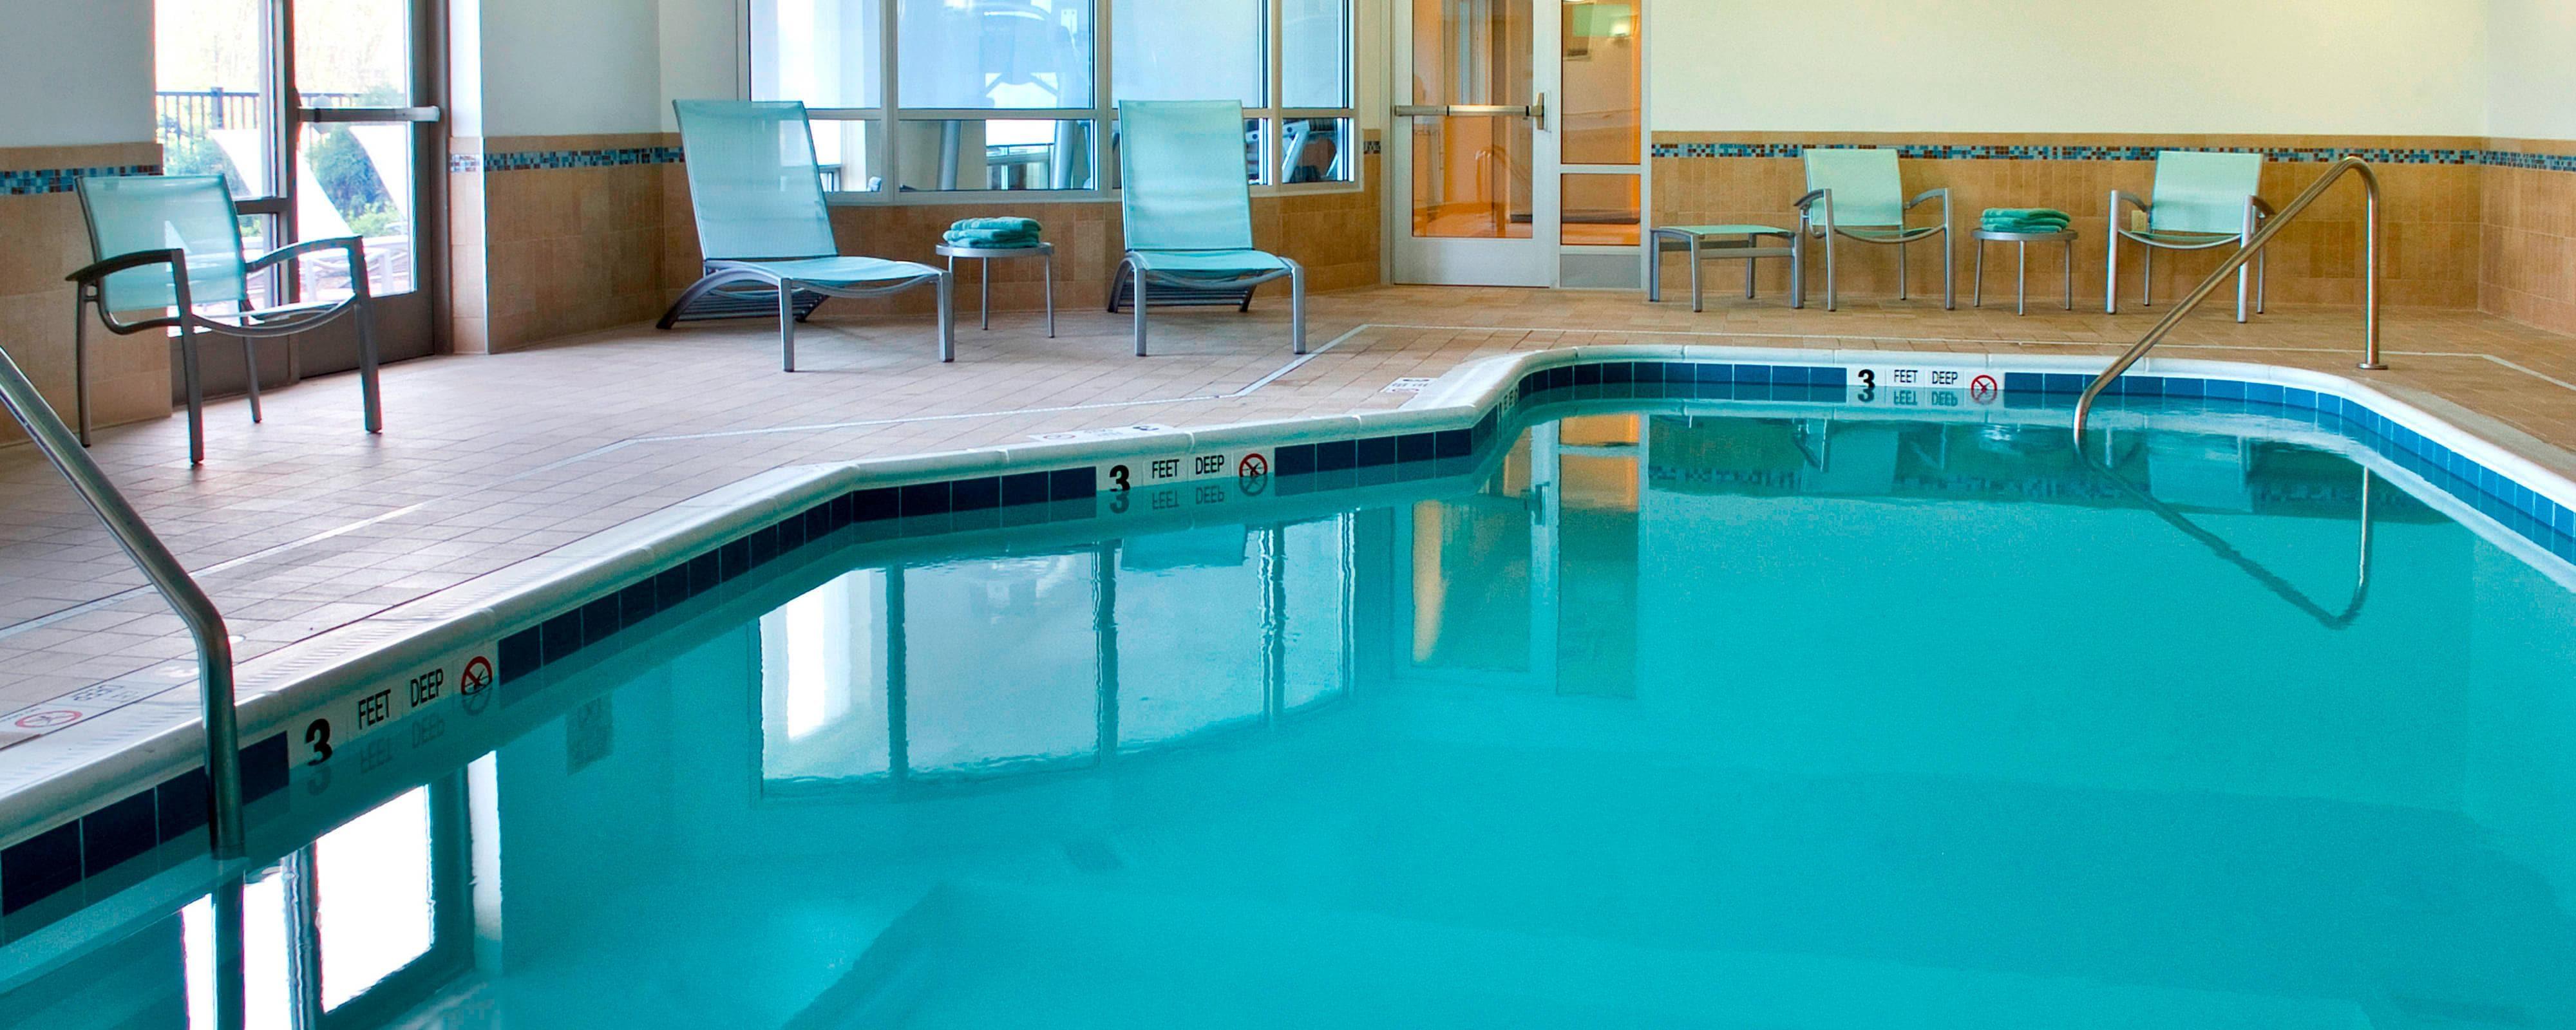 Syracuse Hotel Indoor Pool